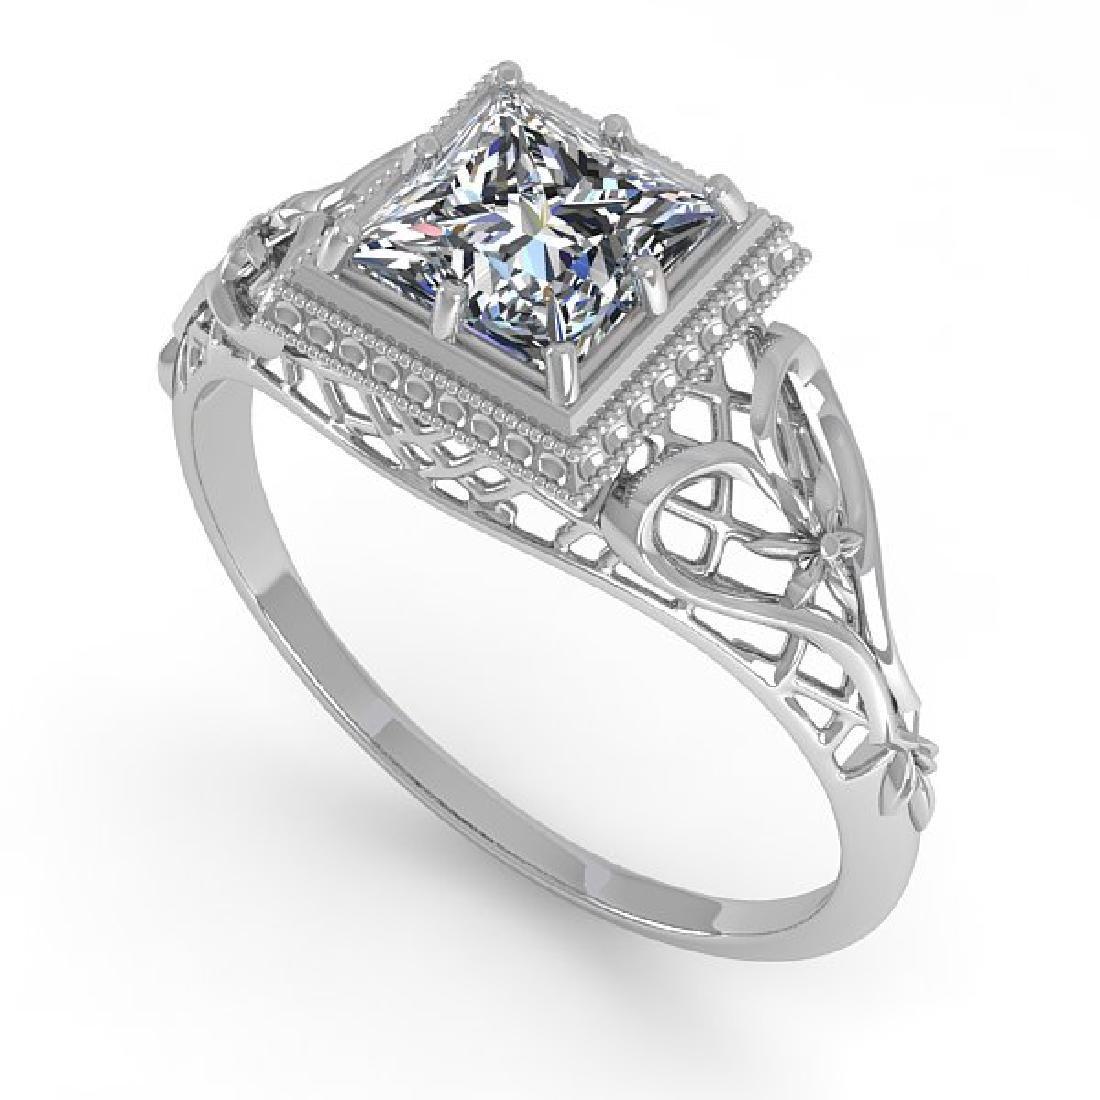 1.0 CTW VS/SI Princess Diamond Solitaire Ring Art Deco - 2